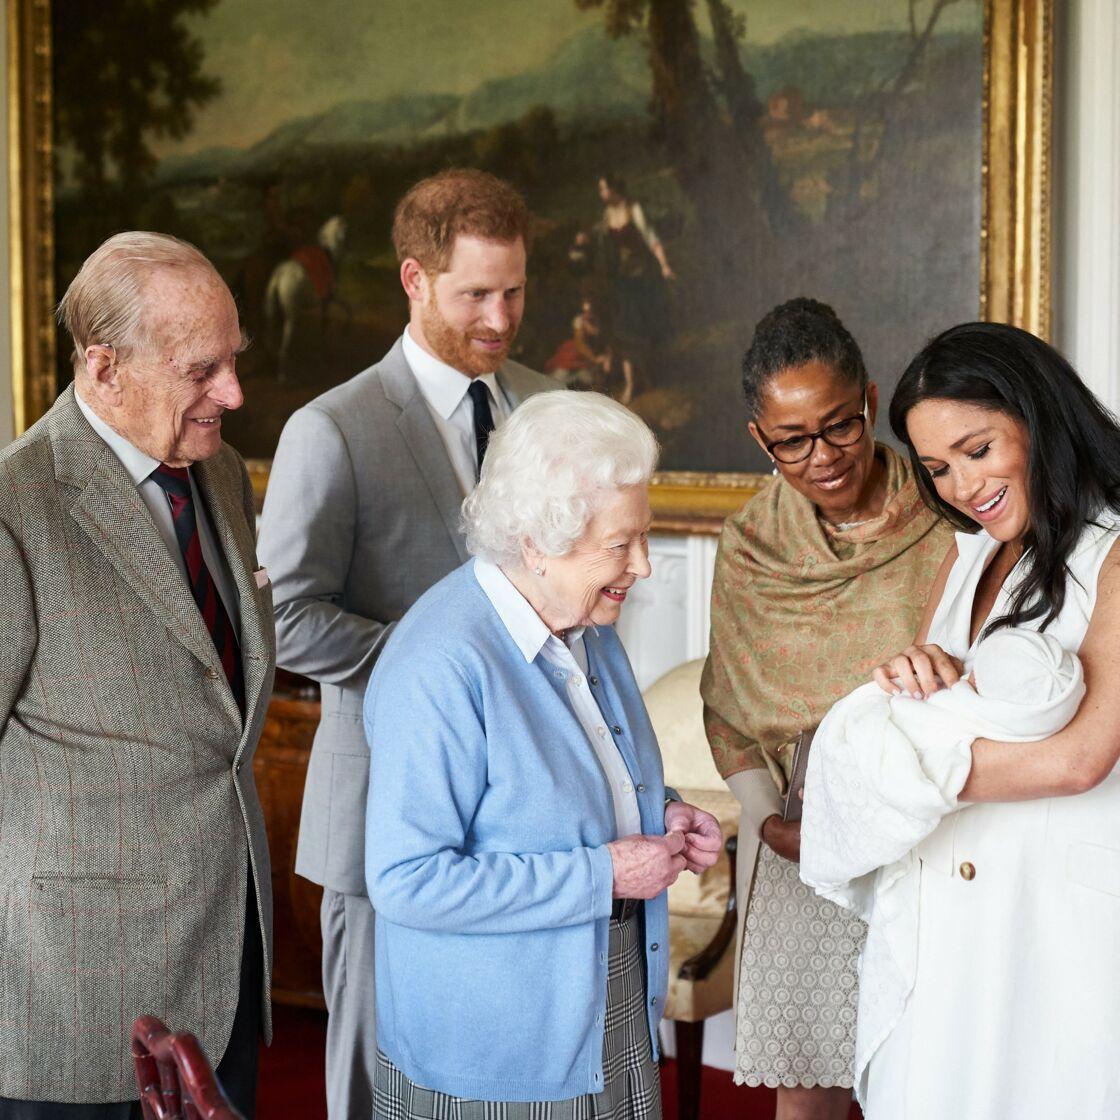 Le prince Philip, le prince Harry, la reine Elizabeth II, Doria Ragland, Meghan Markle et Archie